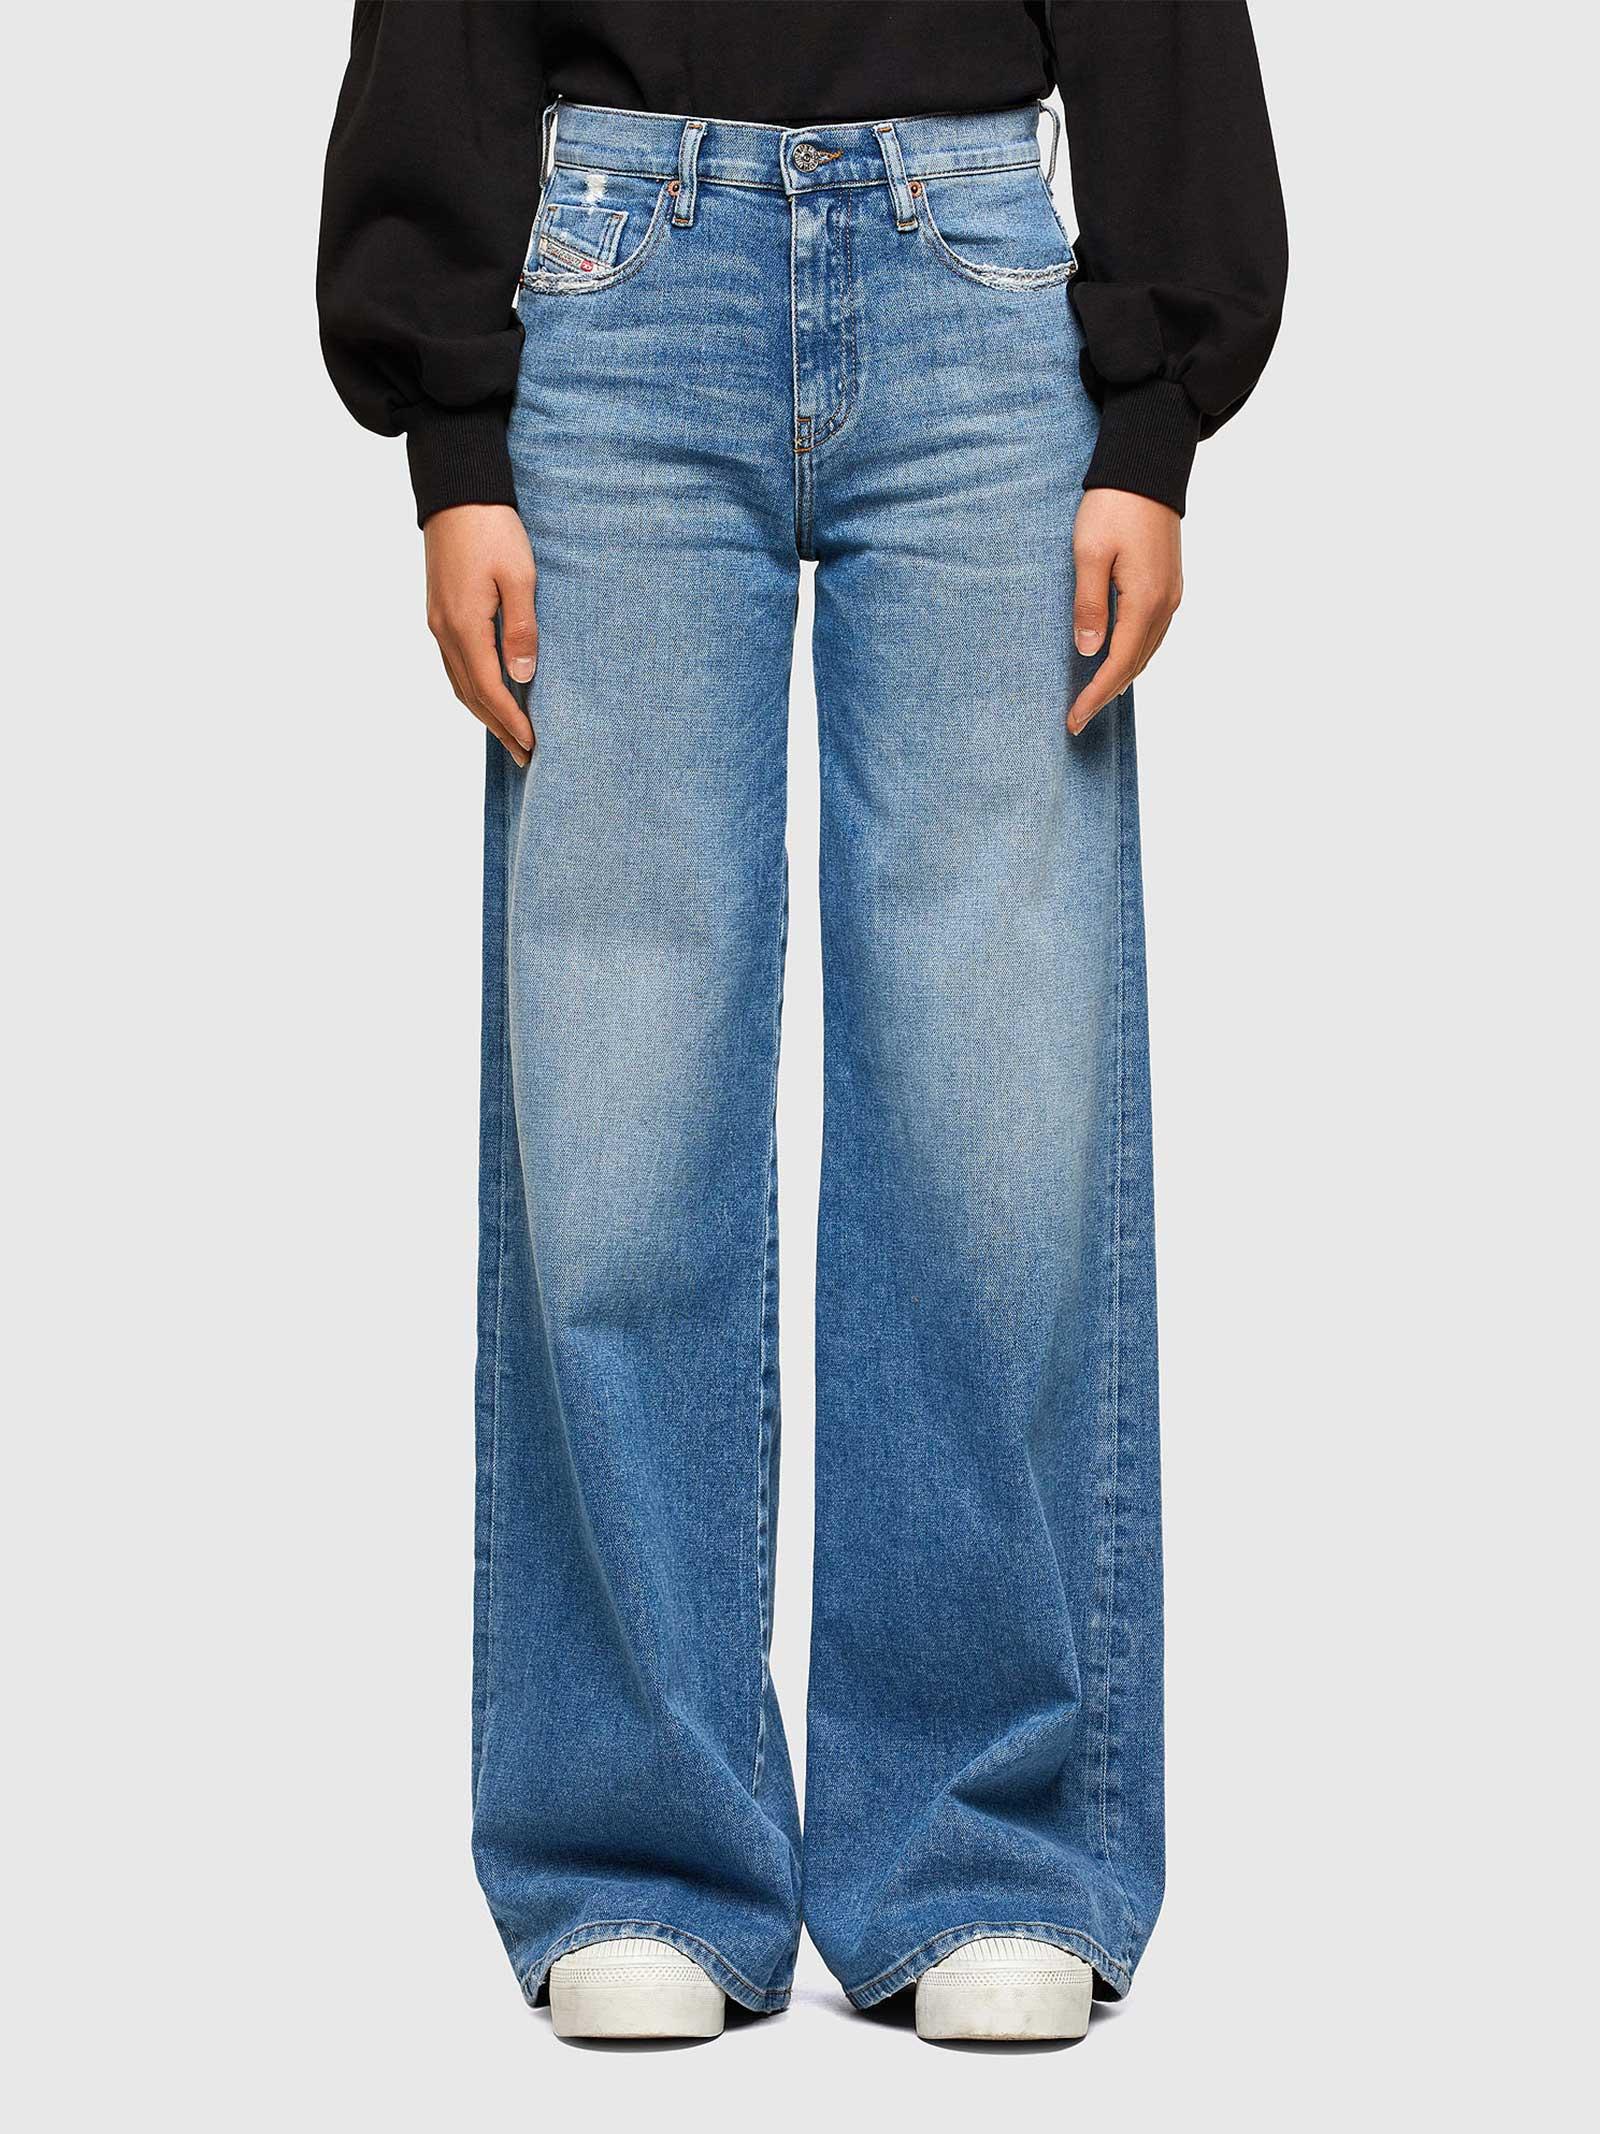 Jeans D-akemi Diesel   Jeans   A00998-009EU01